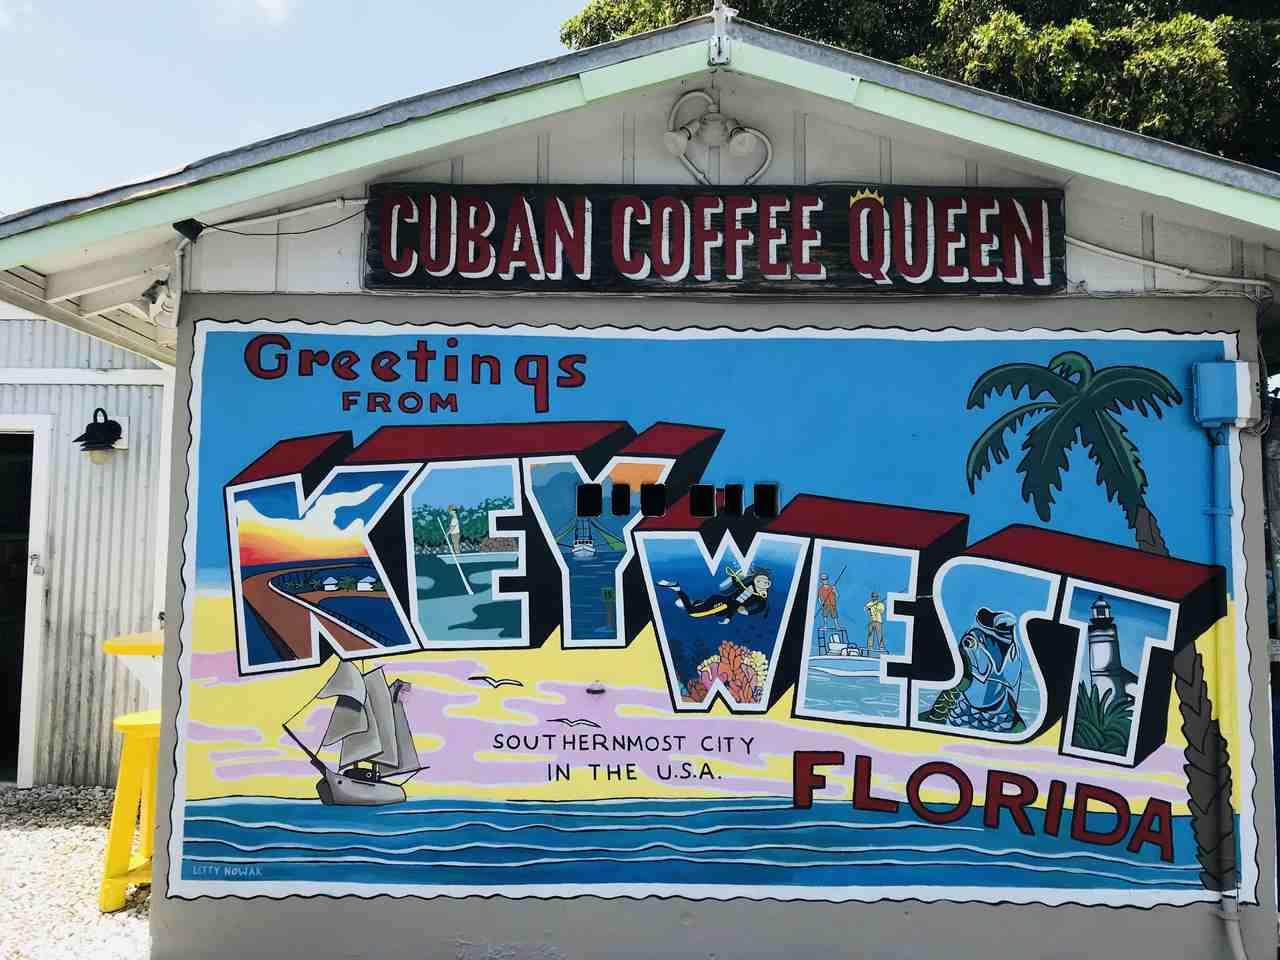 Key West Floryda 71